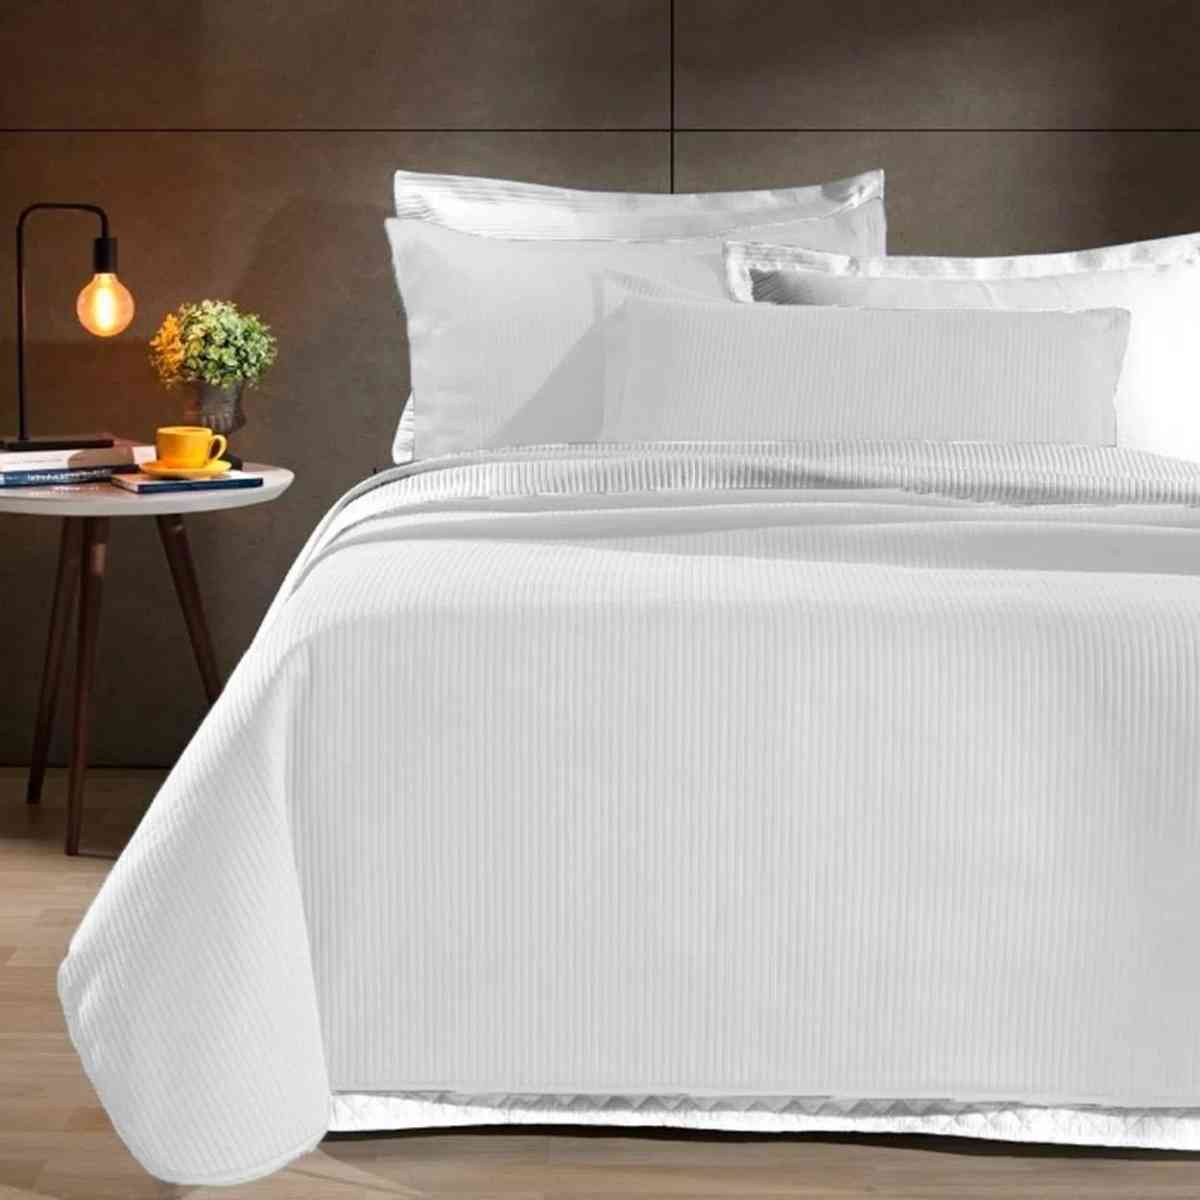 Kit: Cobre leito Colcha Queen Neomalha Ultra Soft Matelassê + 2 Porta Travesseiros Branco